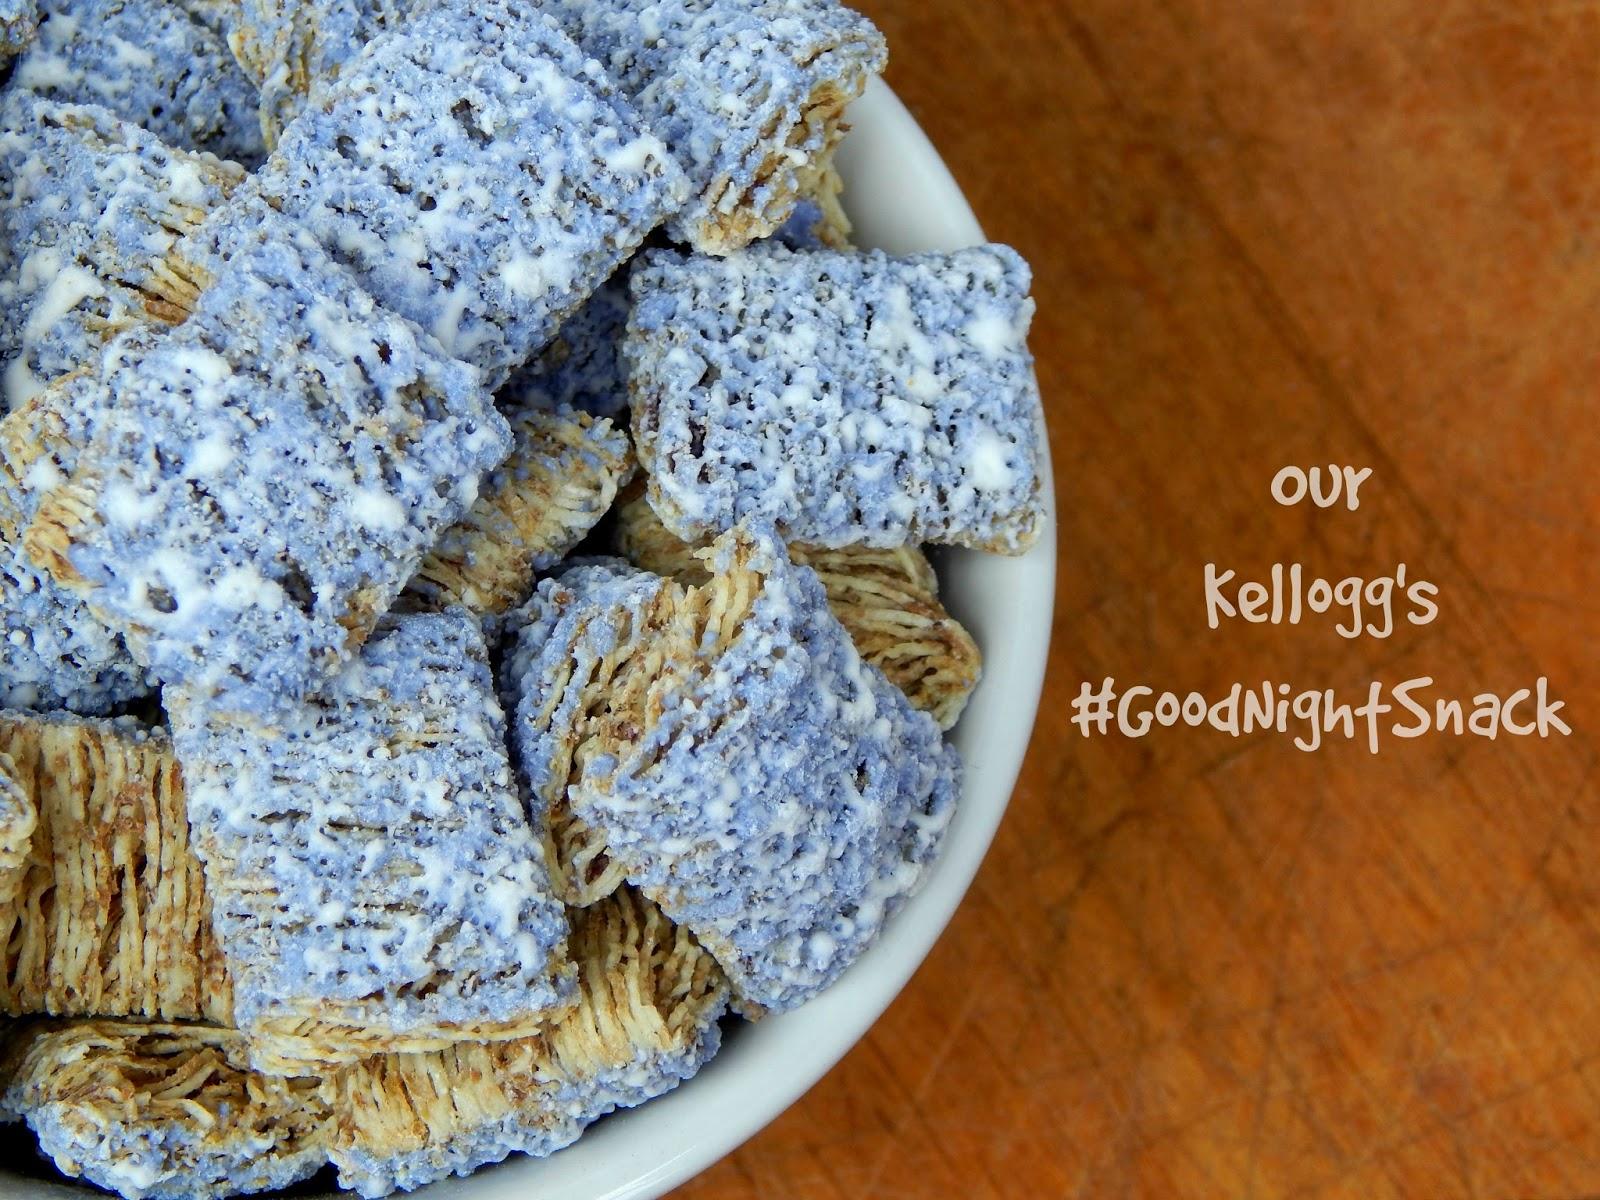 Kellogg's #GoodNightSnack cereal ideas #shop #cbias